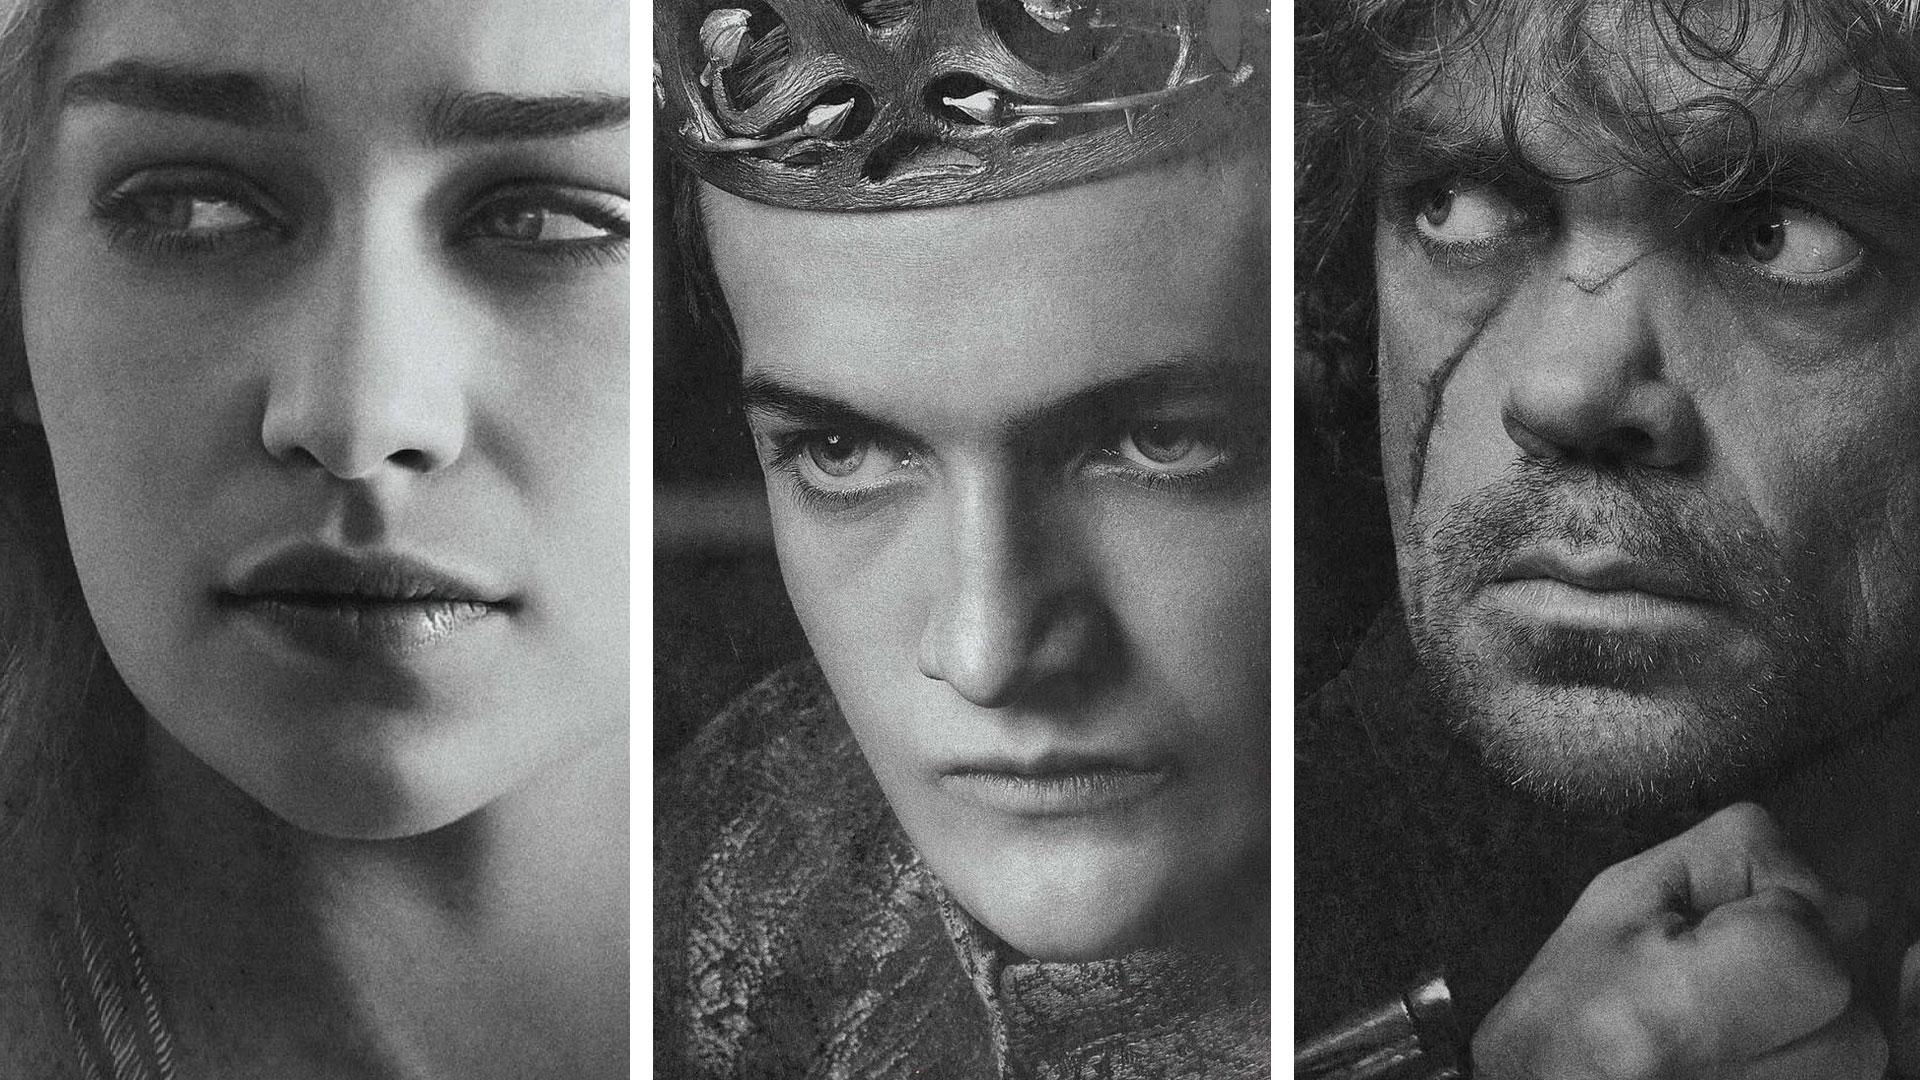 Game Of Thrones Nrk